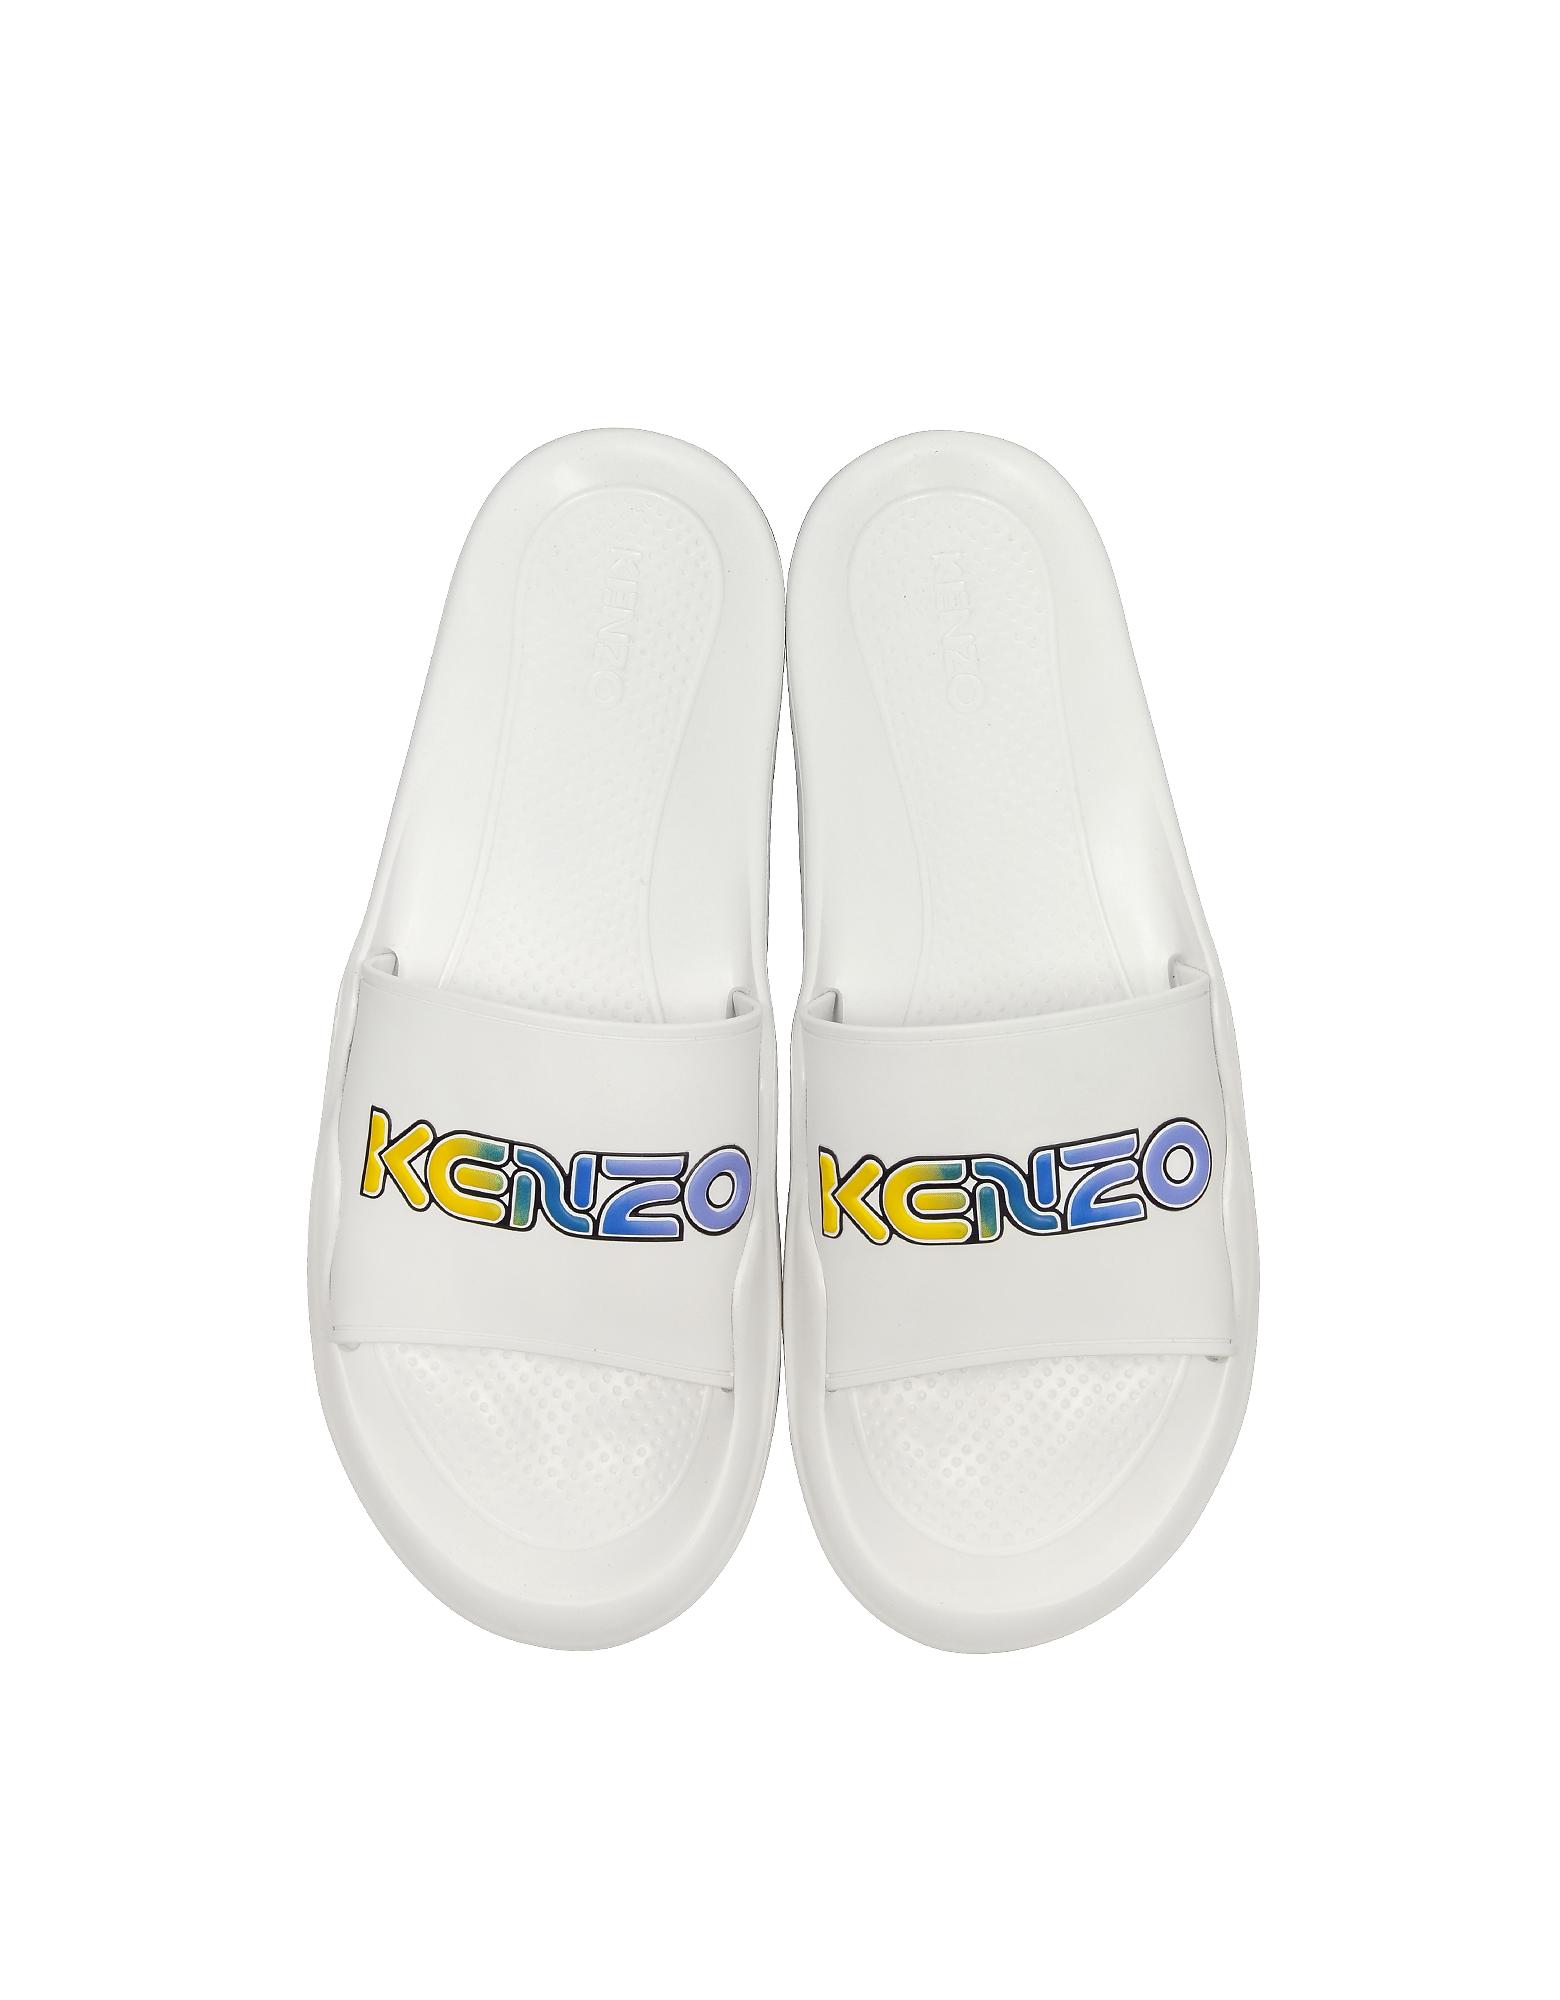 Kenzo Designer Shoes, White Kenzo Logo Pool Mules